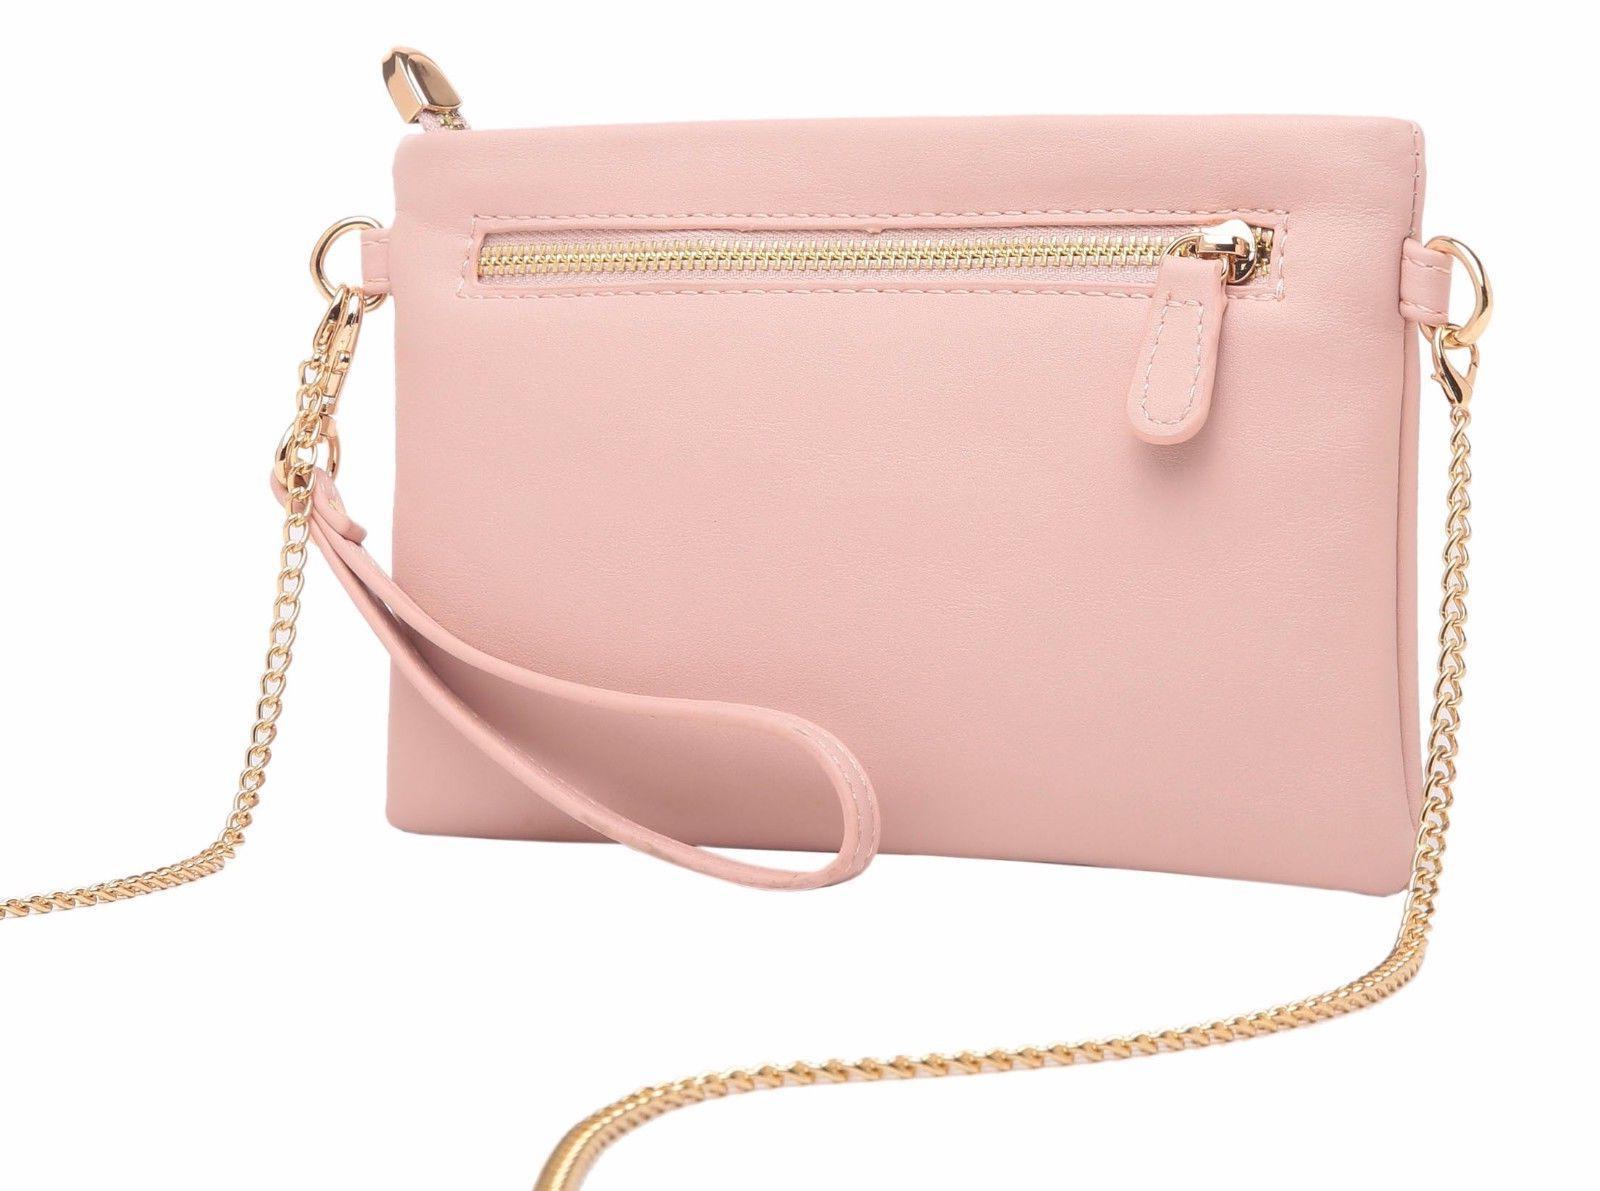 Aitbags Phone Purse Leather Bag